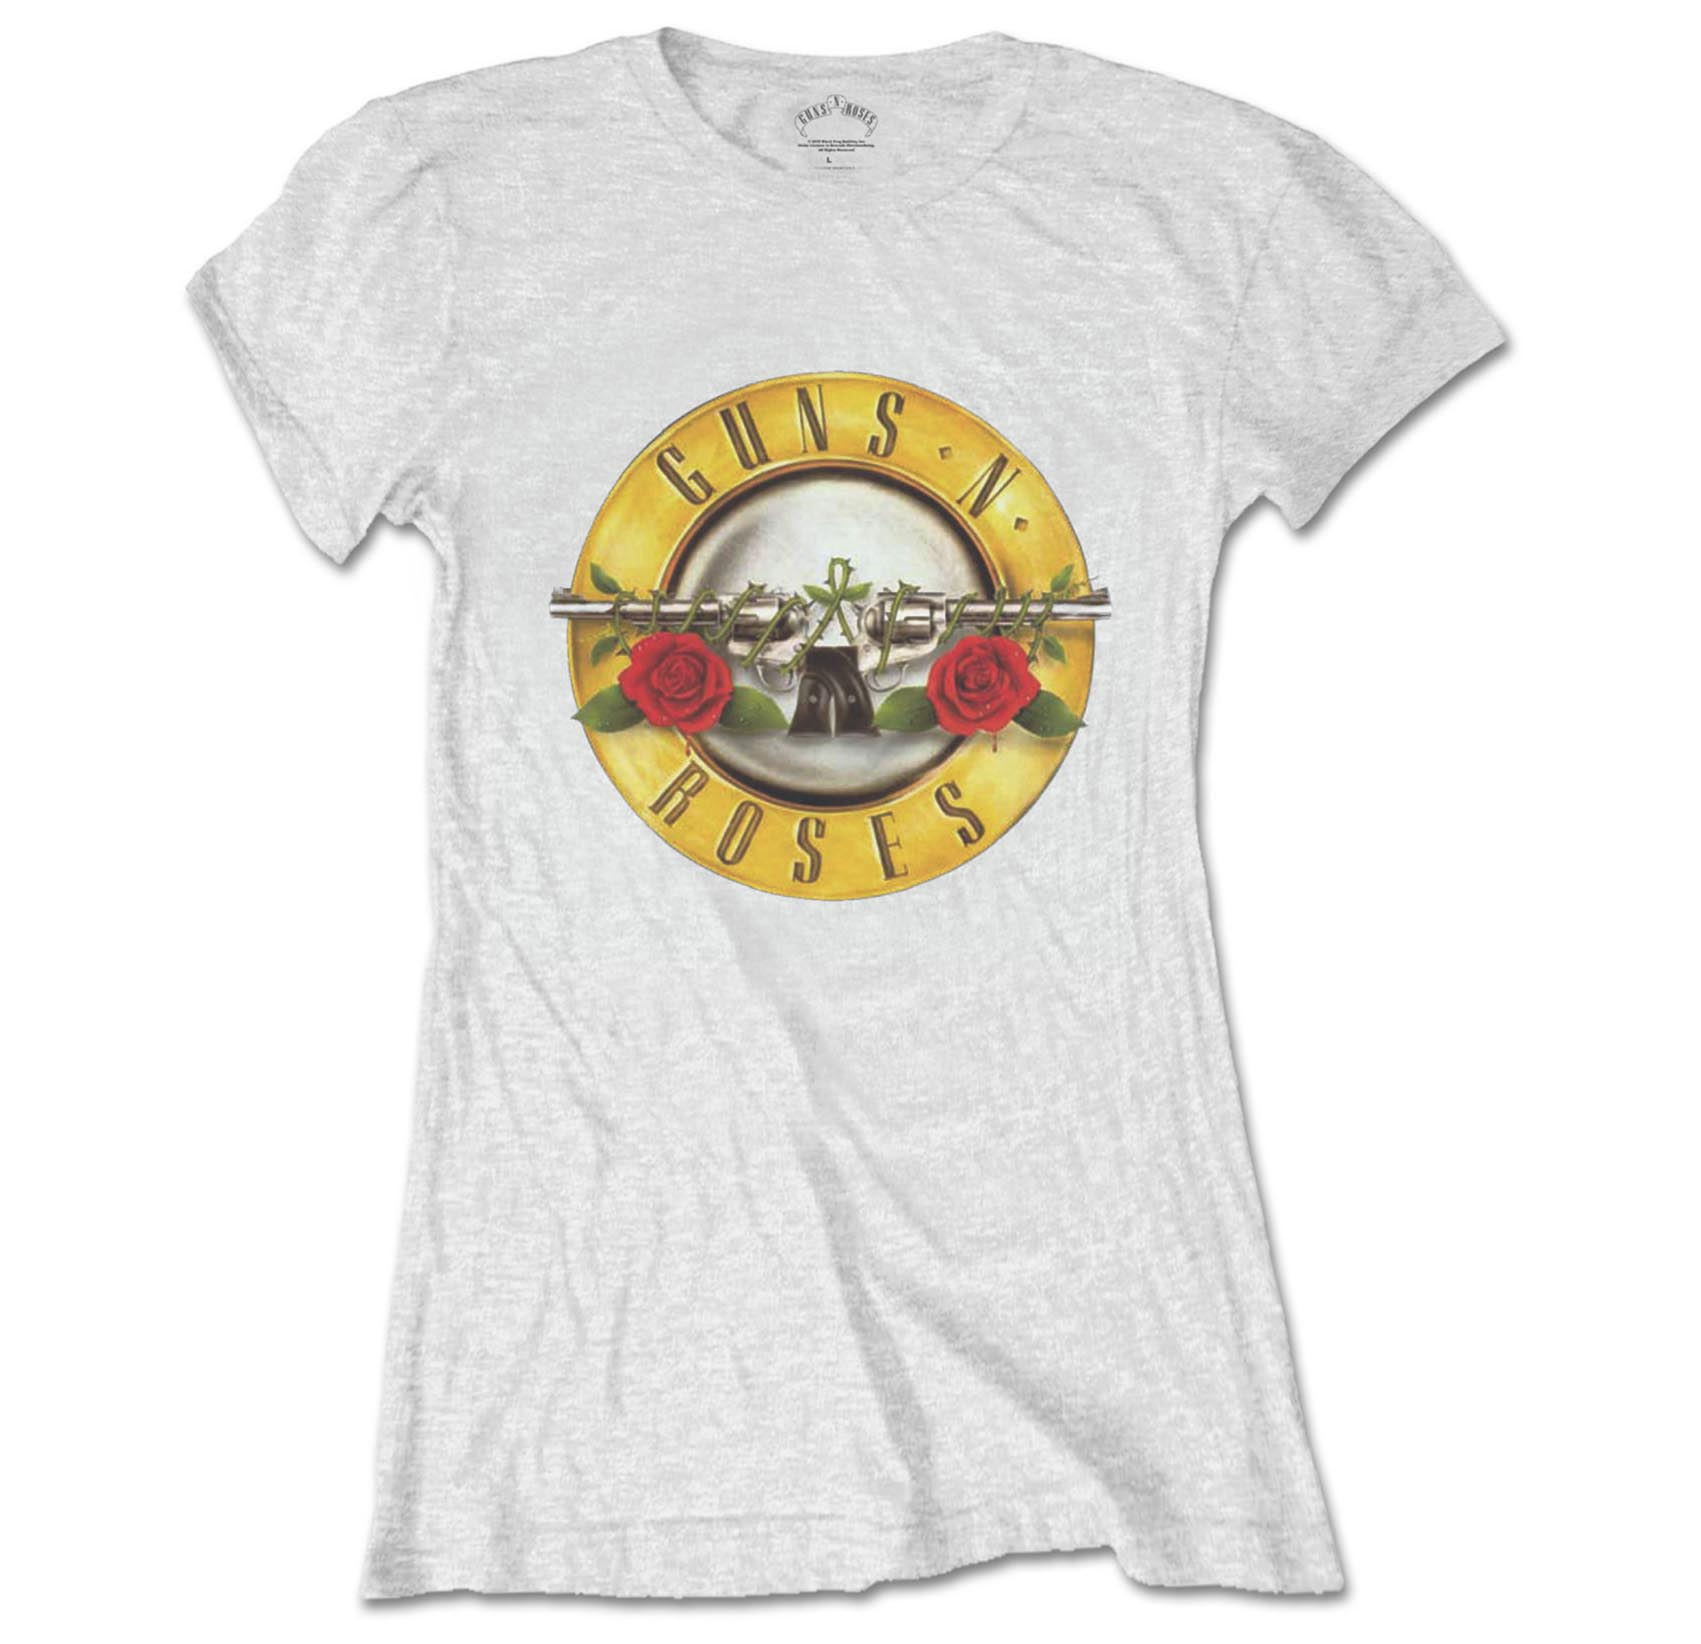 Official Skinny Guns N Roses T Shirt Top White Classic Bullet Logo